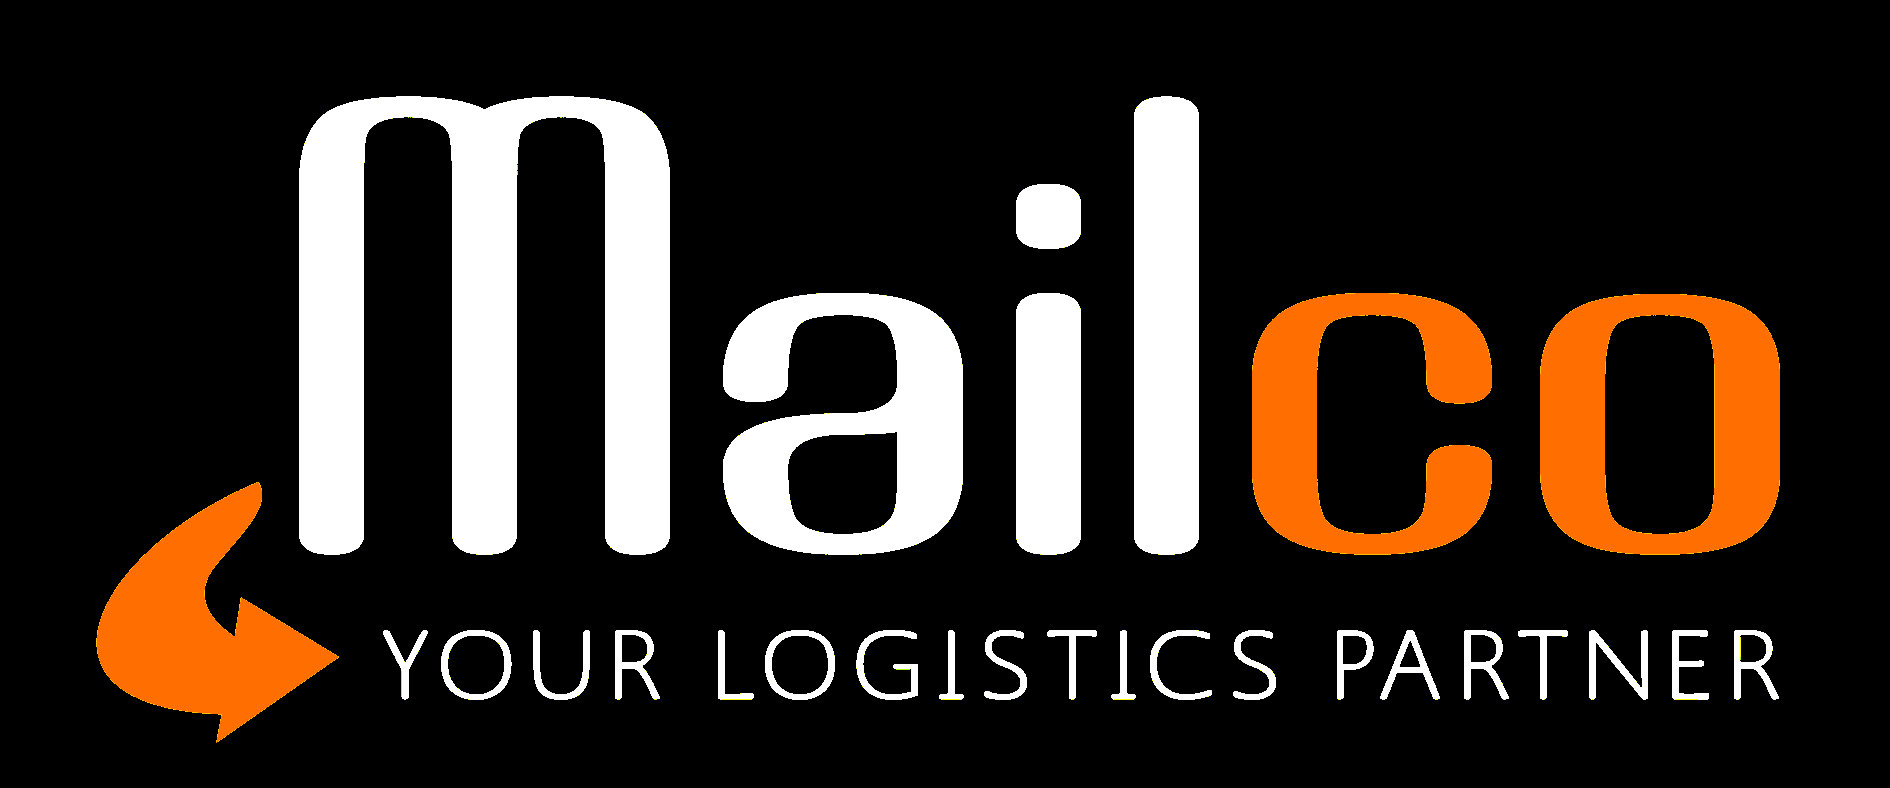 mailco_logo oranssi mustapohja.jpg